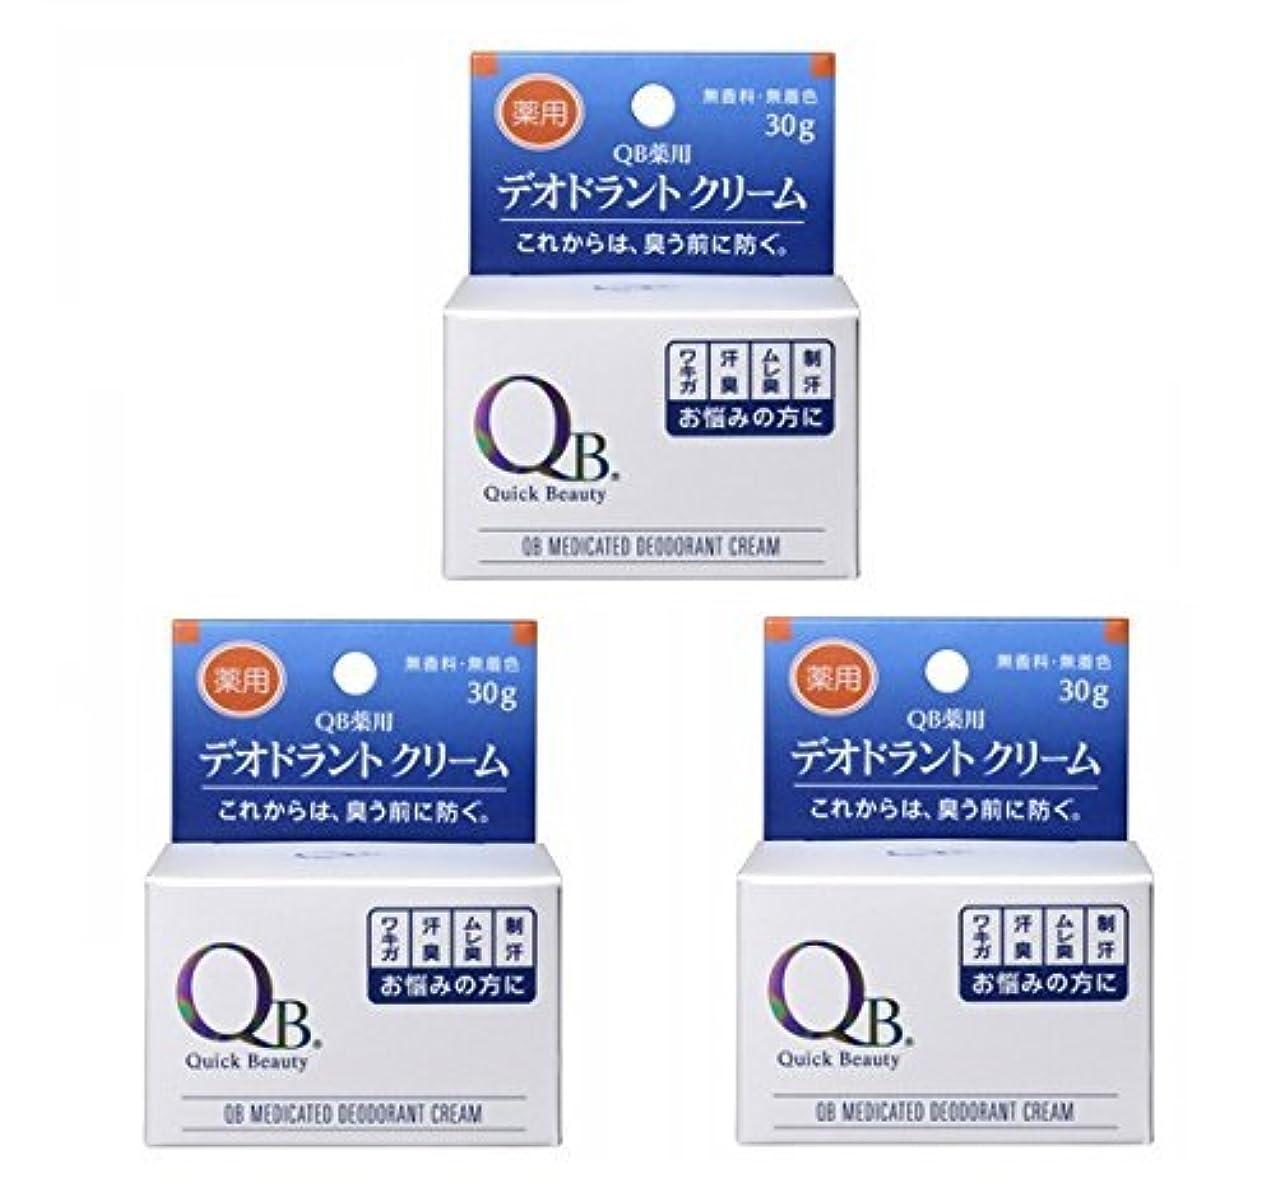 QB薬用デオドラントクリーム 30g×3個セット